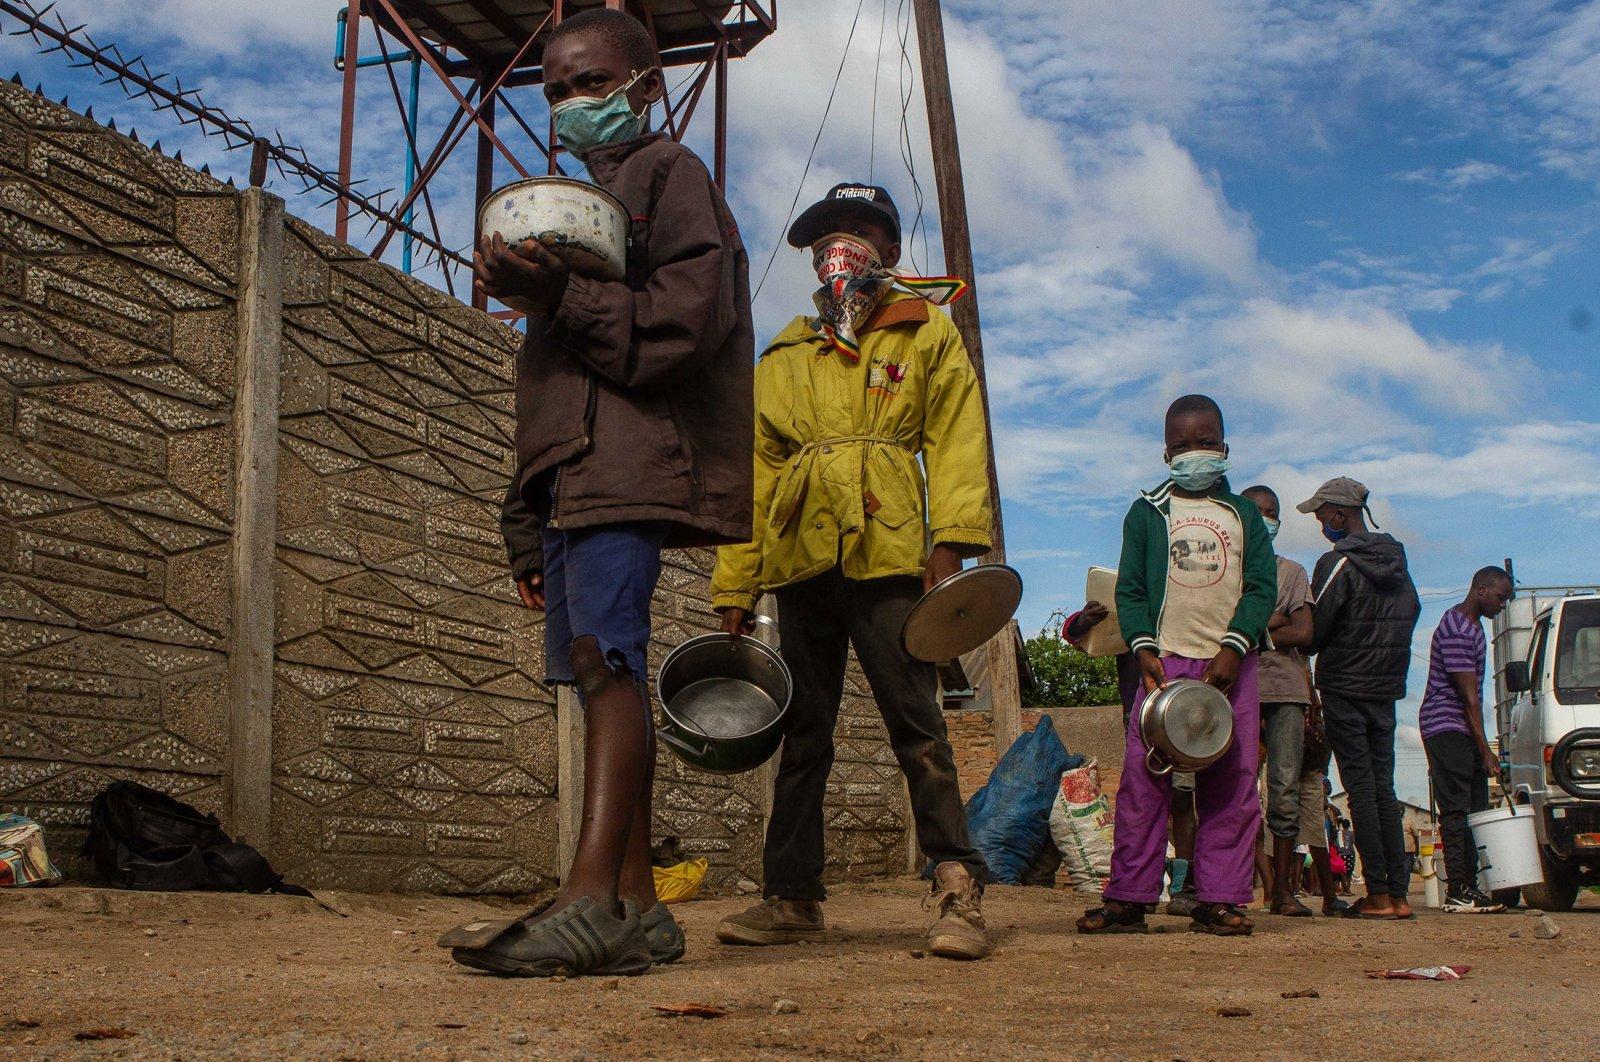 Children queue for porridge in Harare, Zimbabwe, Dec. 31, 2020. (Getty Images)